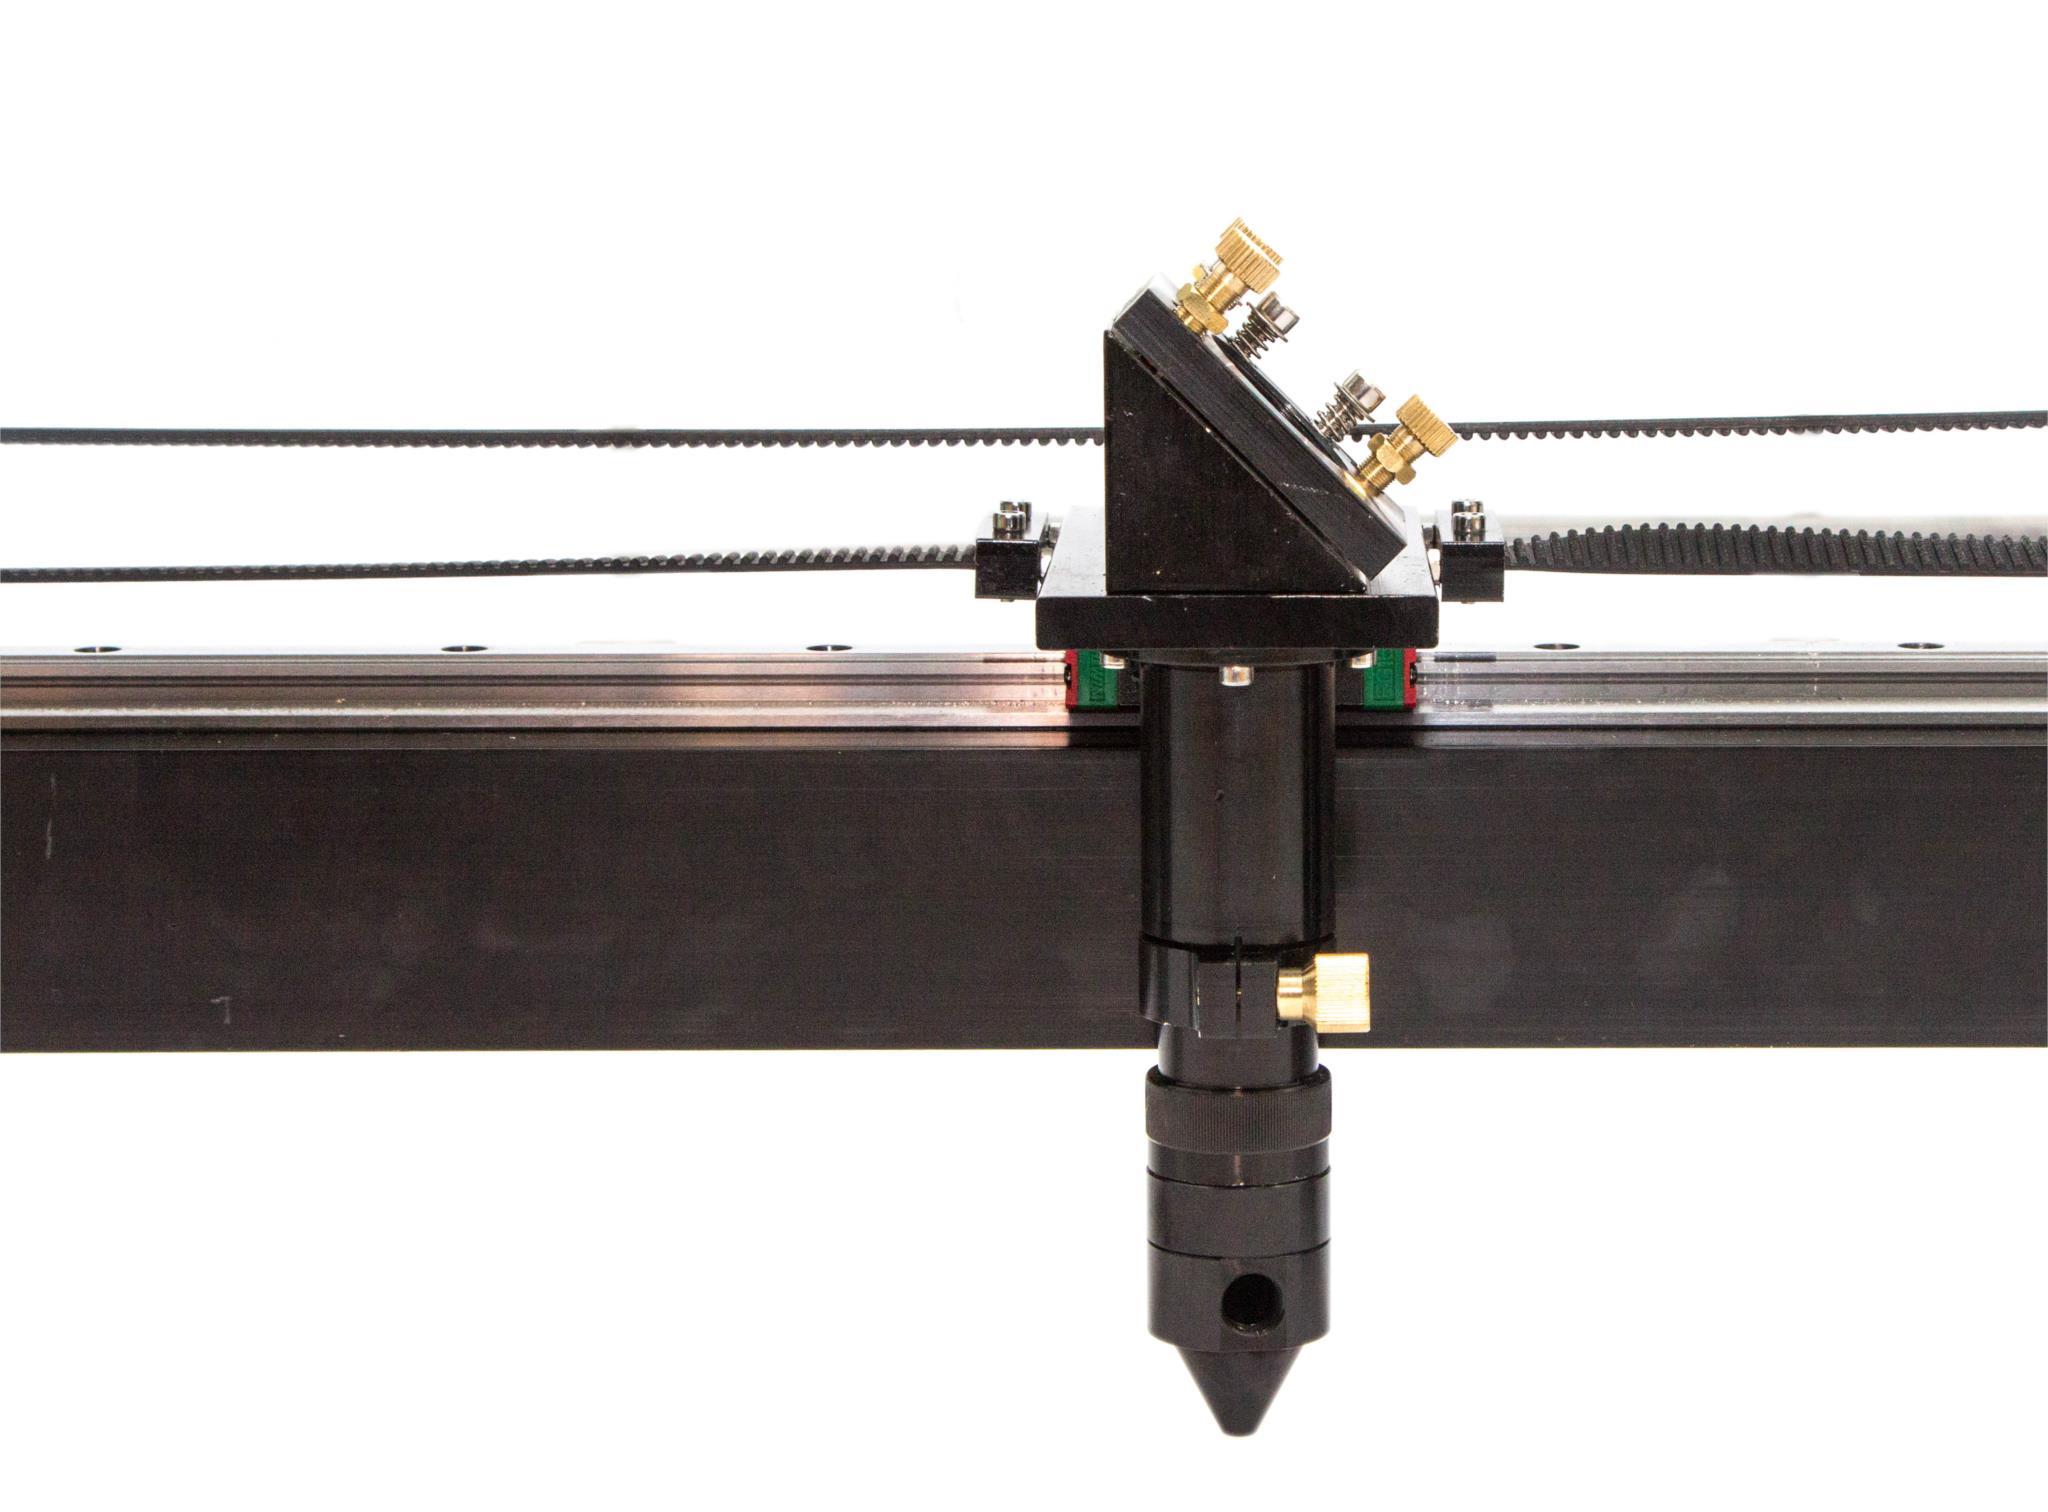 Best Quality CO2 Laser Cutting Head Reflector Diameter Laser Focusing Lens best quality aluminum laser head for co2 laser cutting engraving machine lens dia 20mm fl63 5mm left in beam